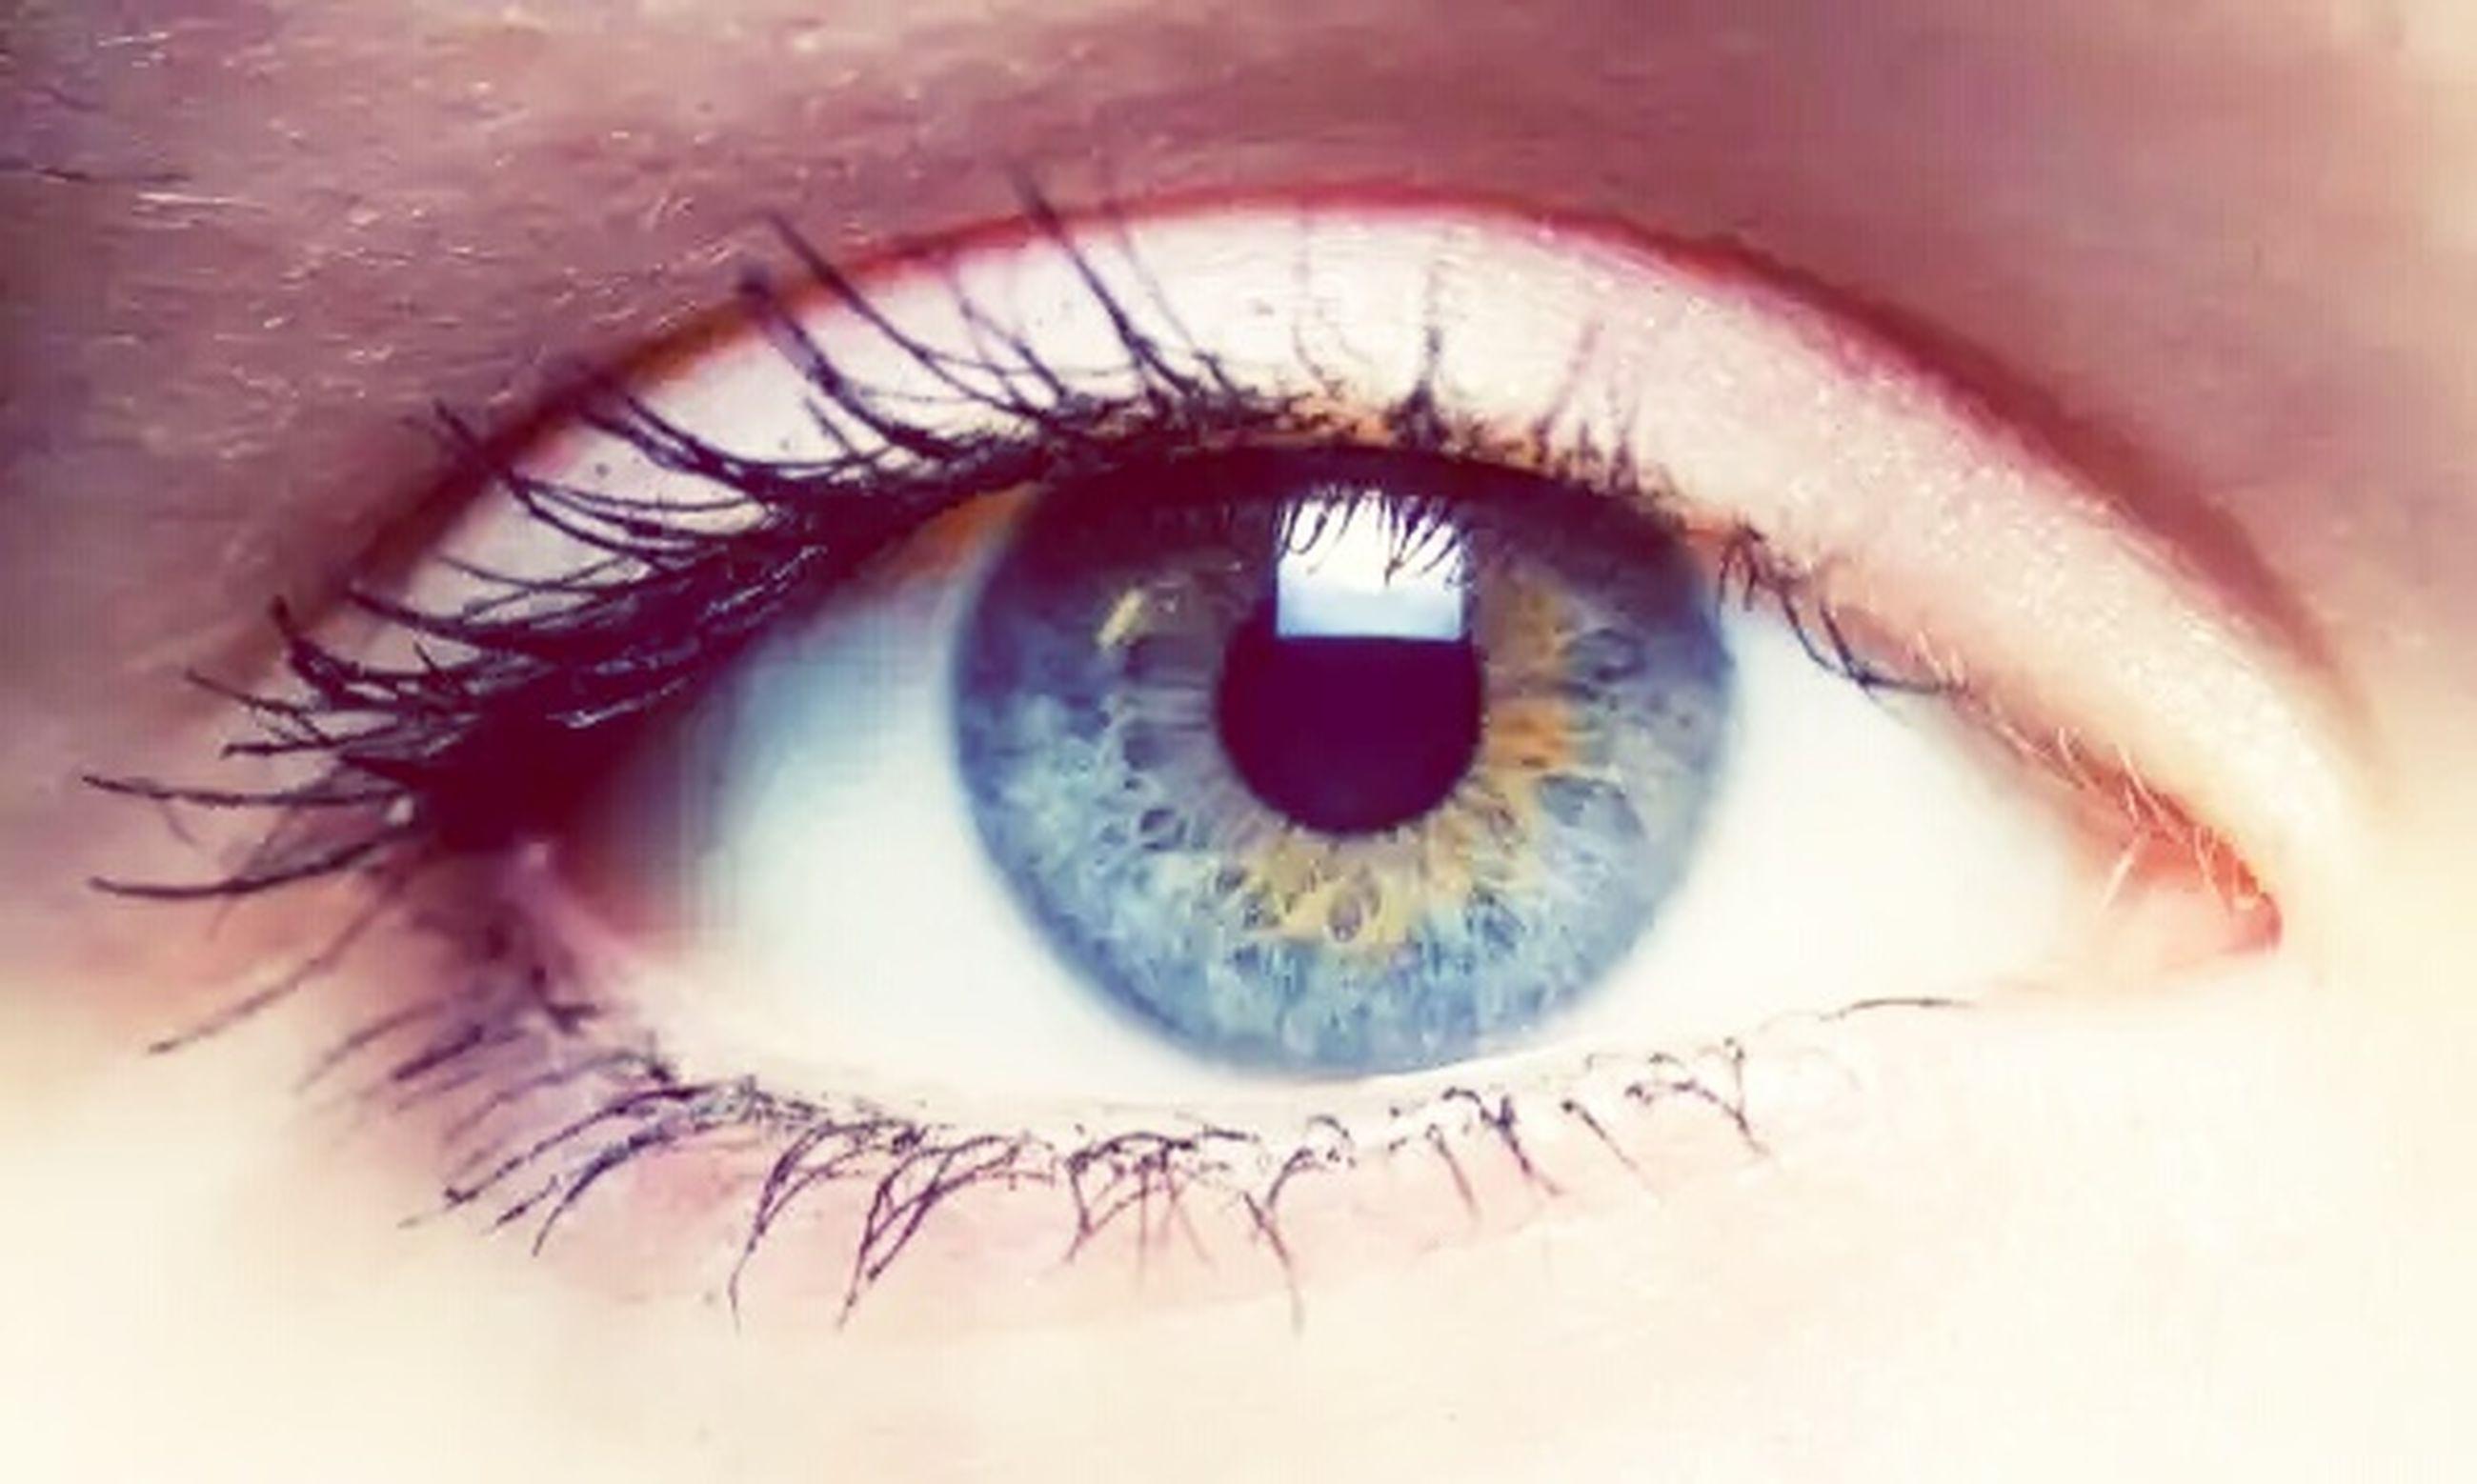 human eye, eyelash, eyesight, sensory perception, close-up, portrait, eyeball, looking at camera, extreme close-up, iris - eye, eyebrow, part of, human skin, extreme close up, vision, human face, unrecognizable person